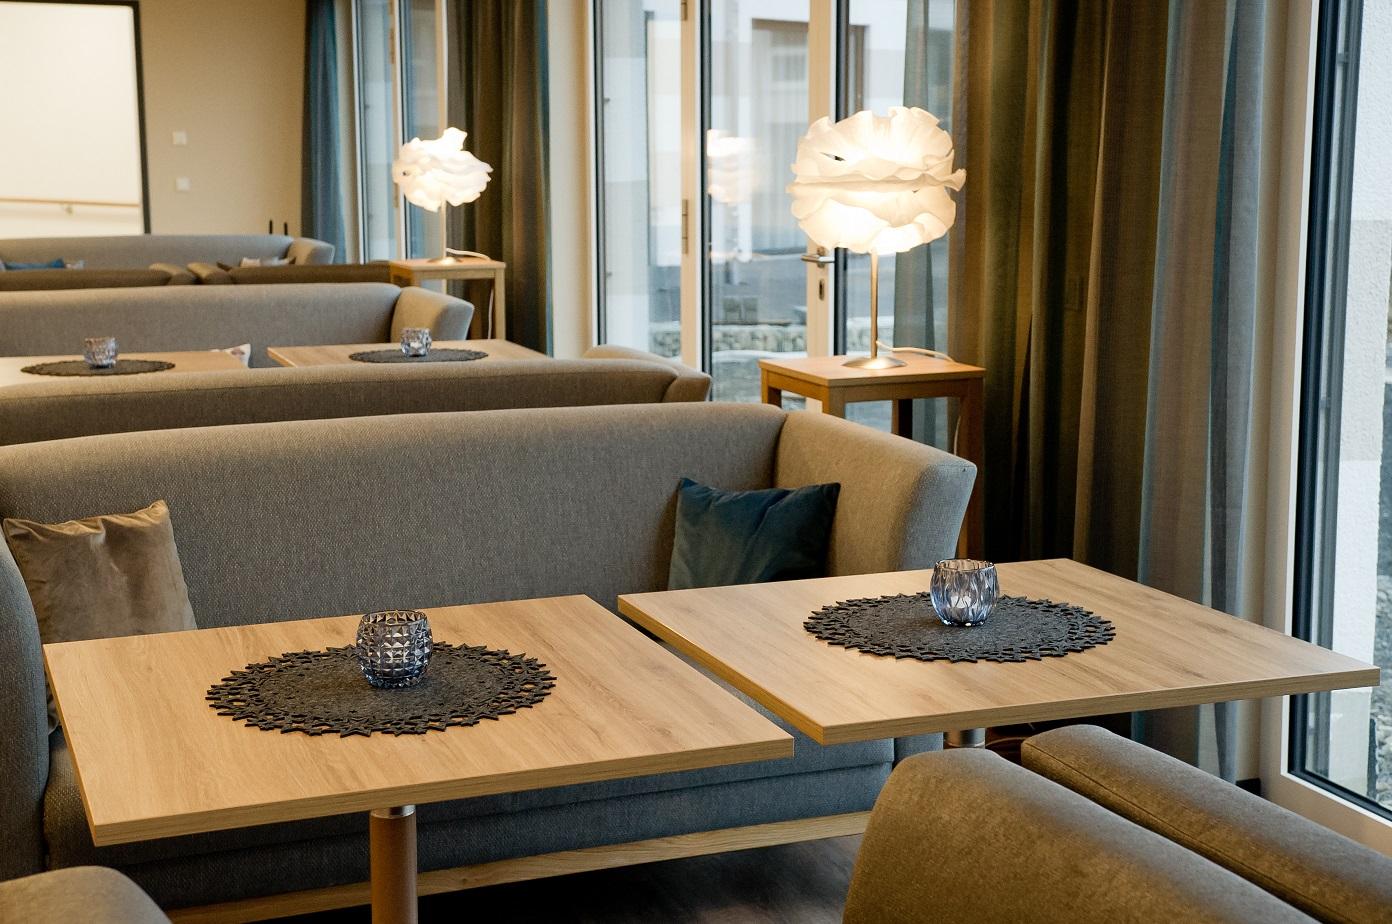 Restaurant Speisekammer - Seniorzentrum - Alte Lahnbrücke Wetzlar